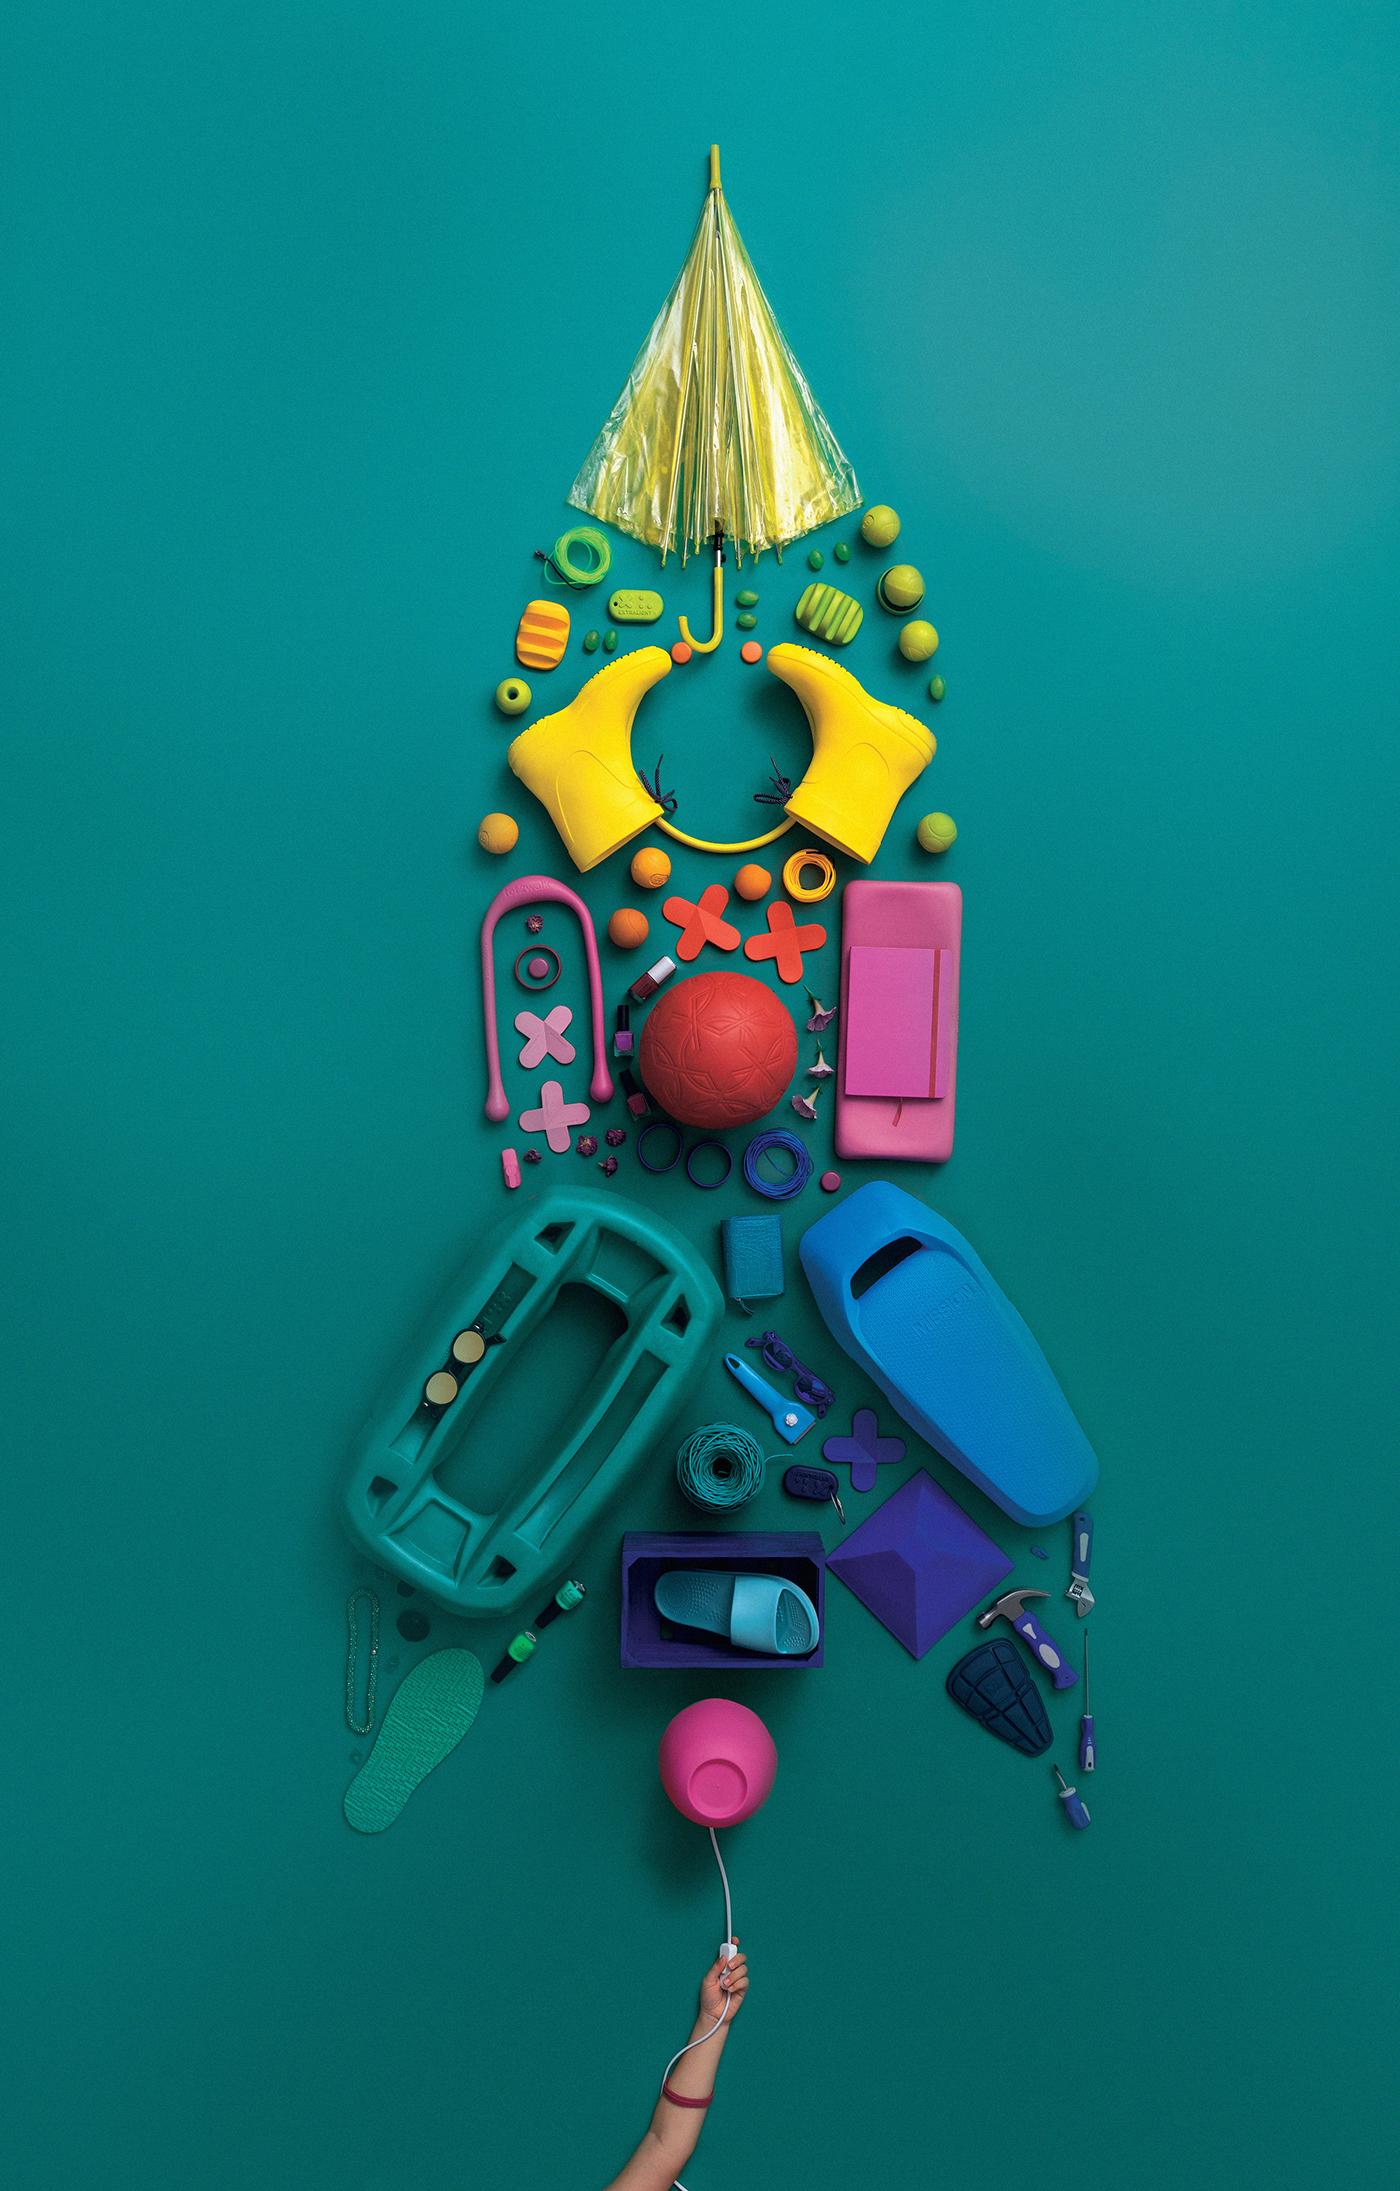 art direction  bologna brahmino bramante flatlay Italy Photography  plastic recycle reuse